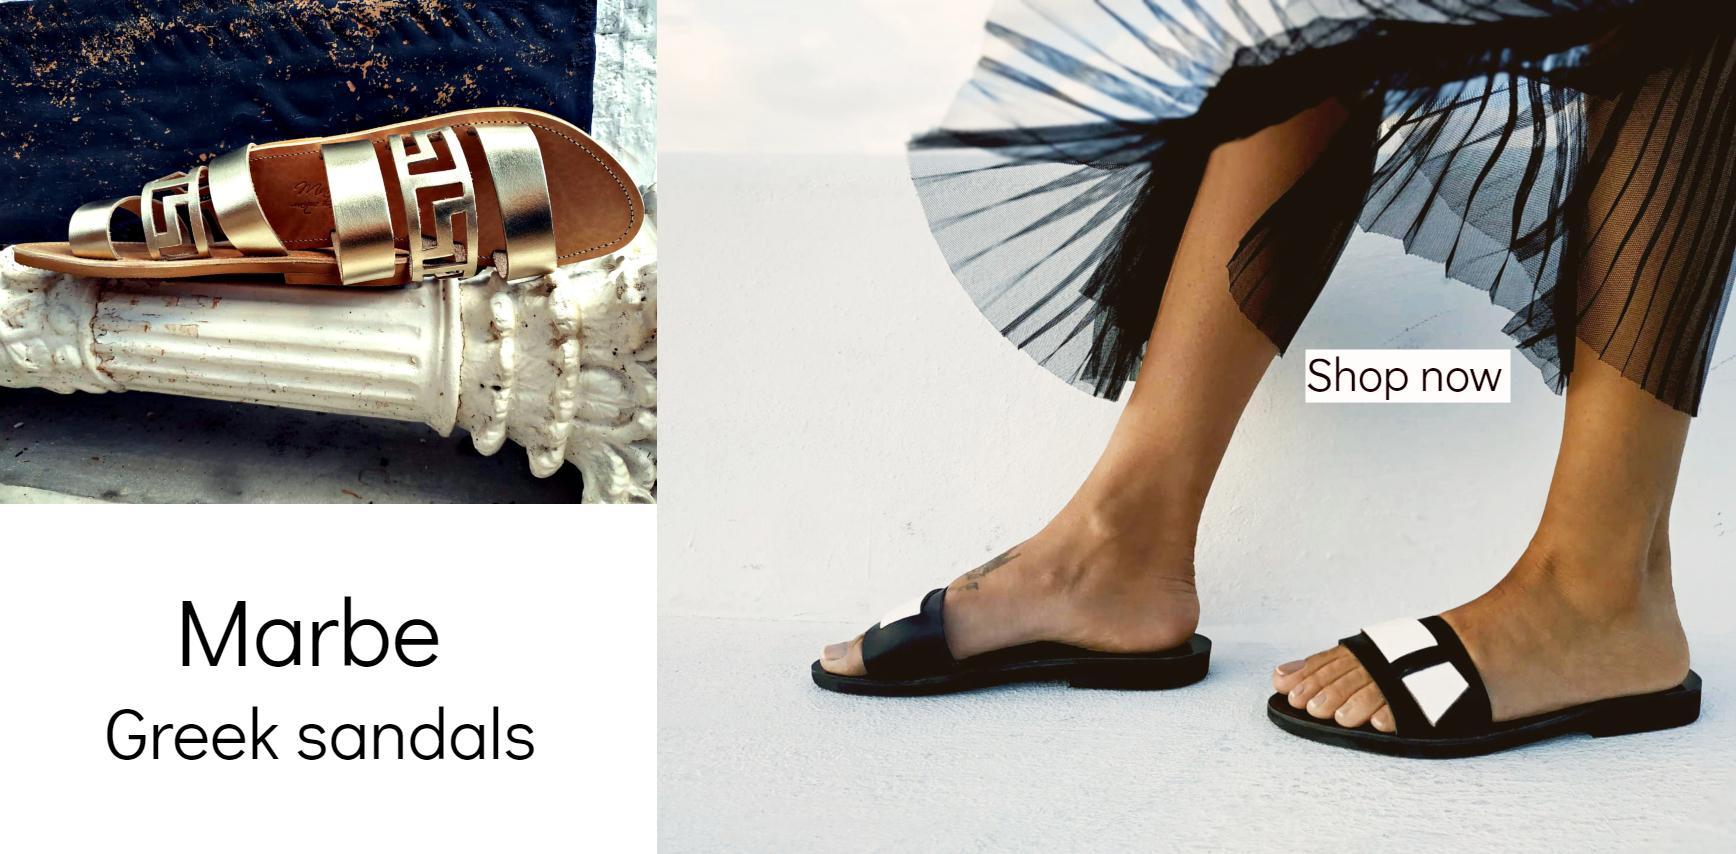 e7e902935830d Marbe Unique Handcrafts | Genuine Leather Sandals Boho Greek Sandals